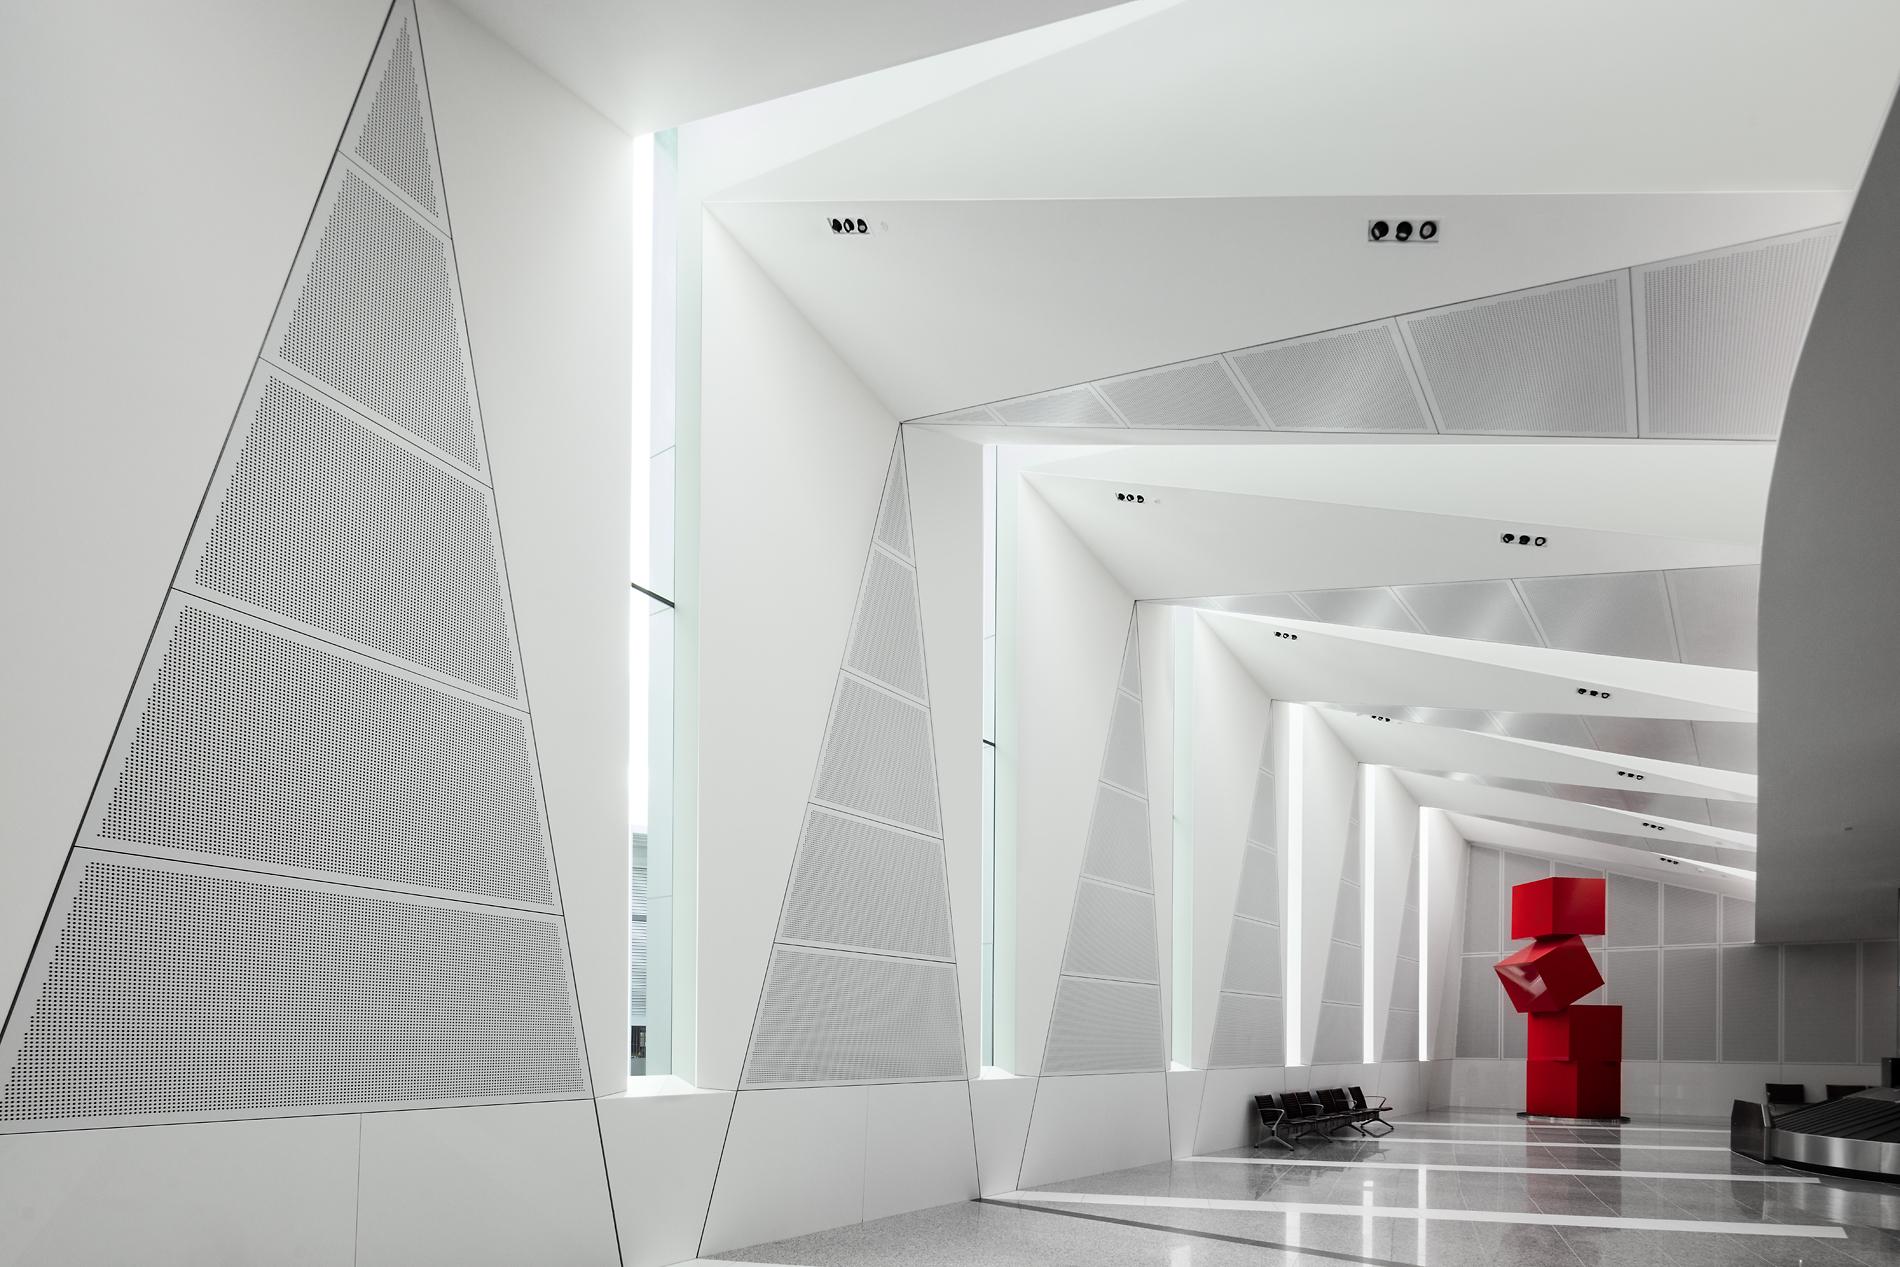 Canberra International Airport